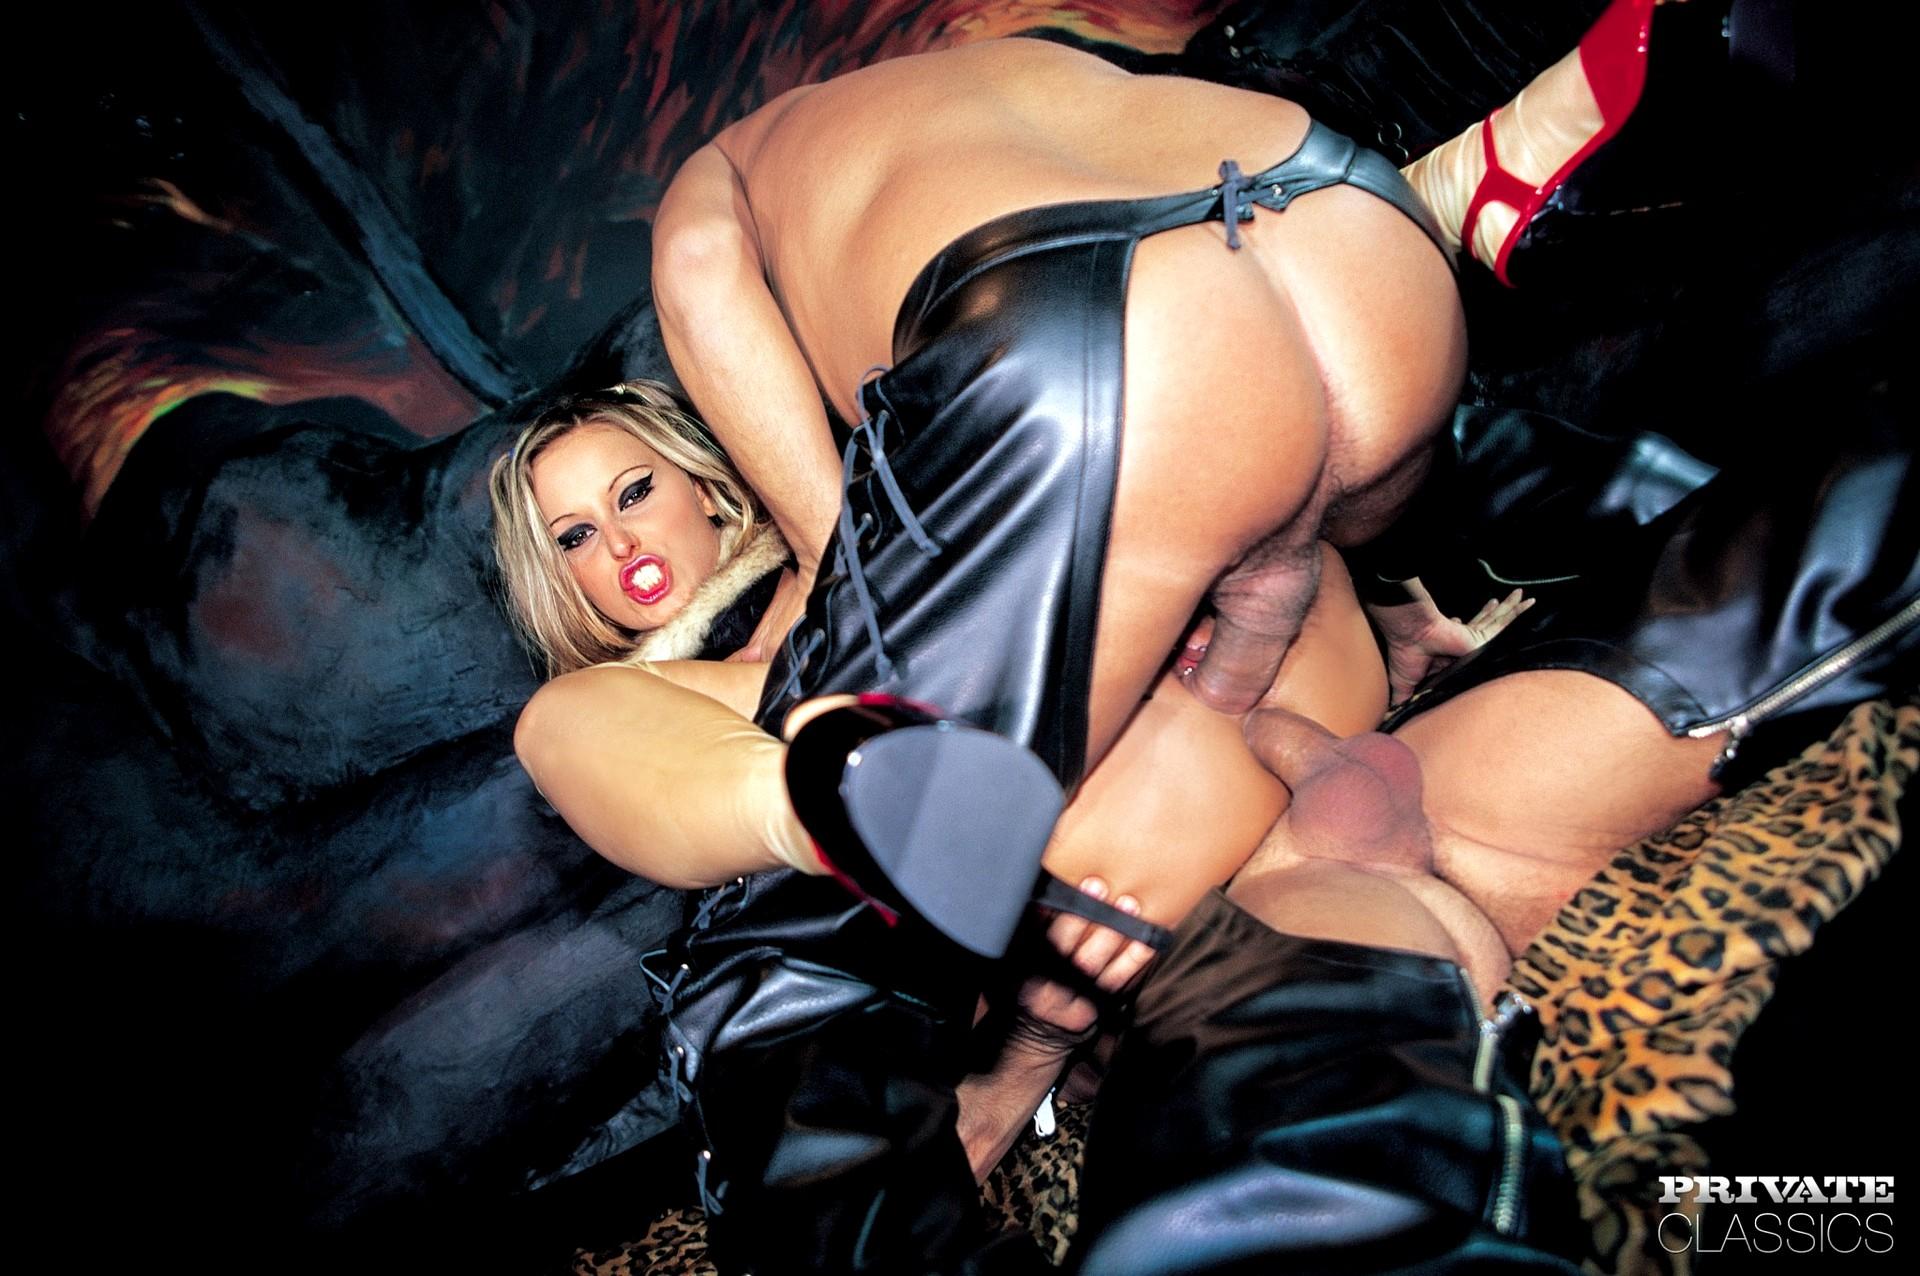 Amateur video wife massage man prostate